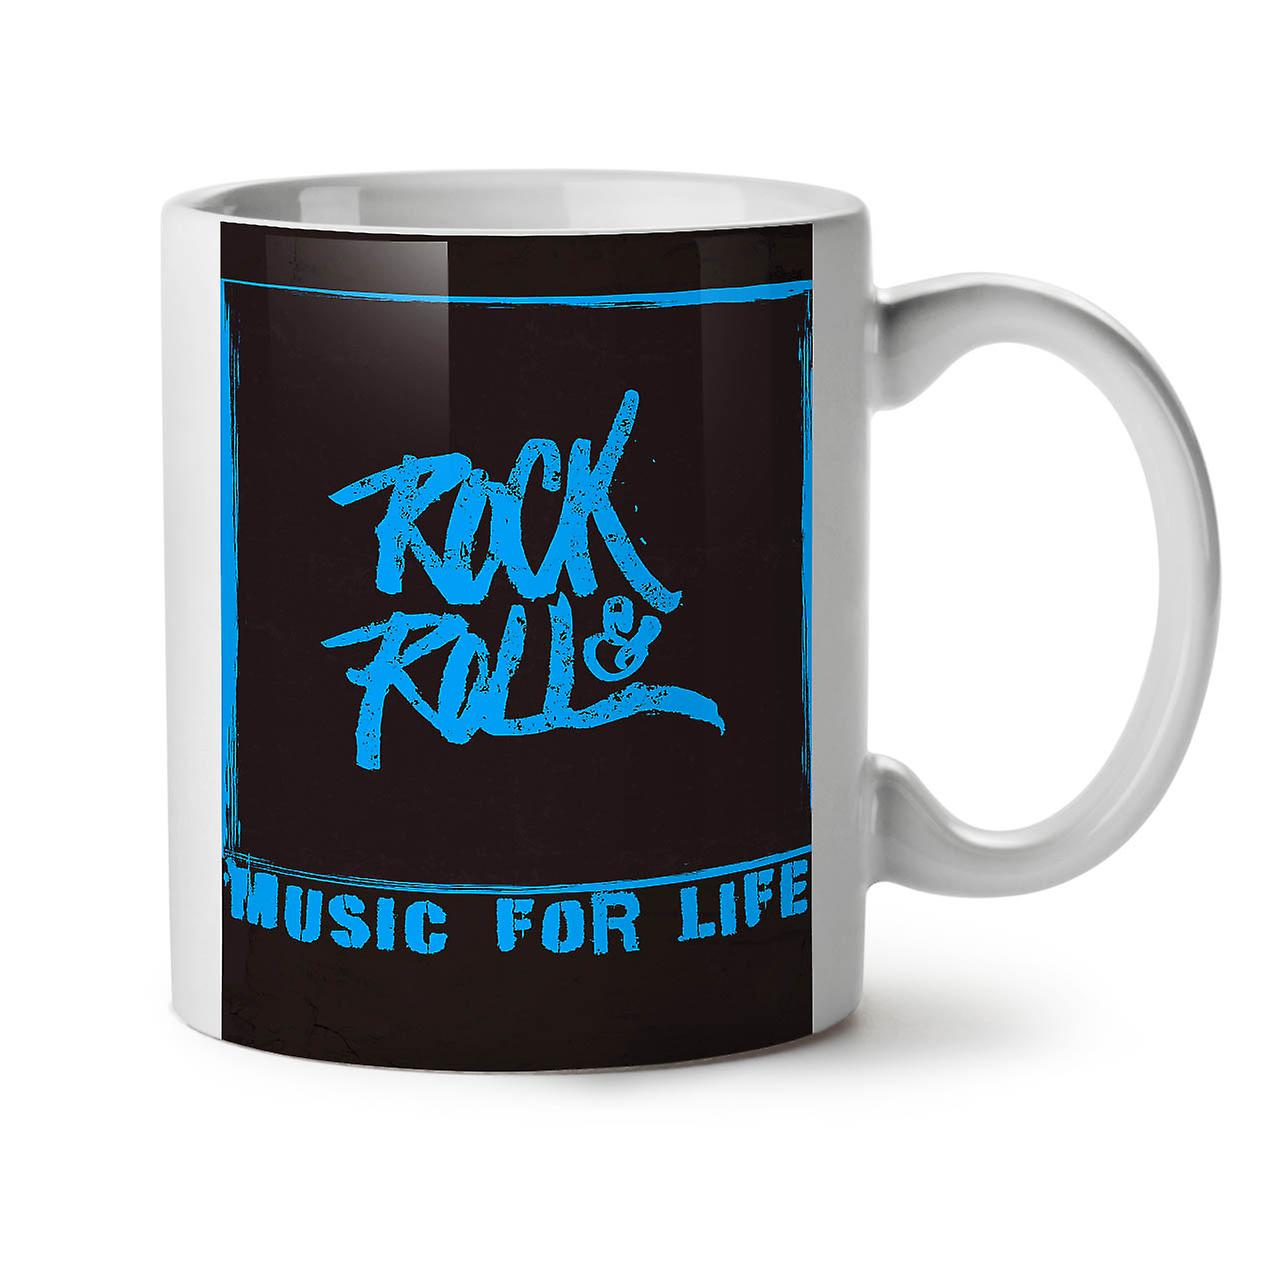 11 Nouveau Blanc OzWellcoda Roll Rock Tasse Life And Céramique Thé Café 35RAL4jq